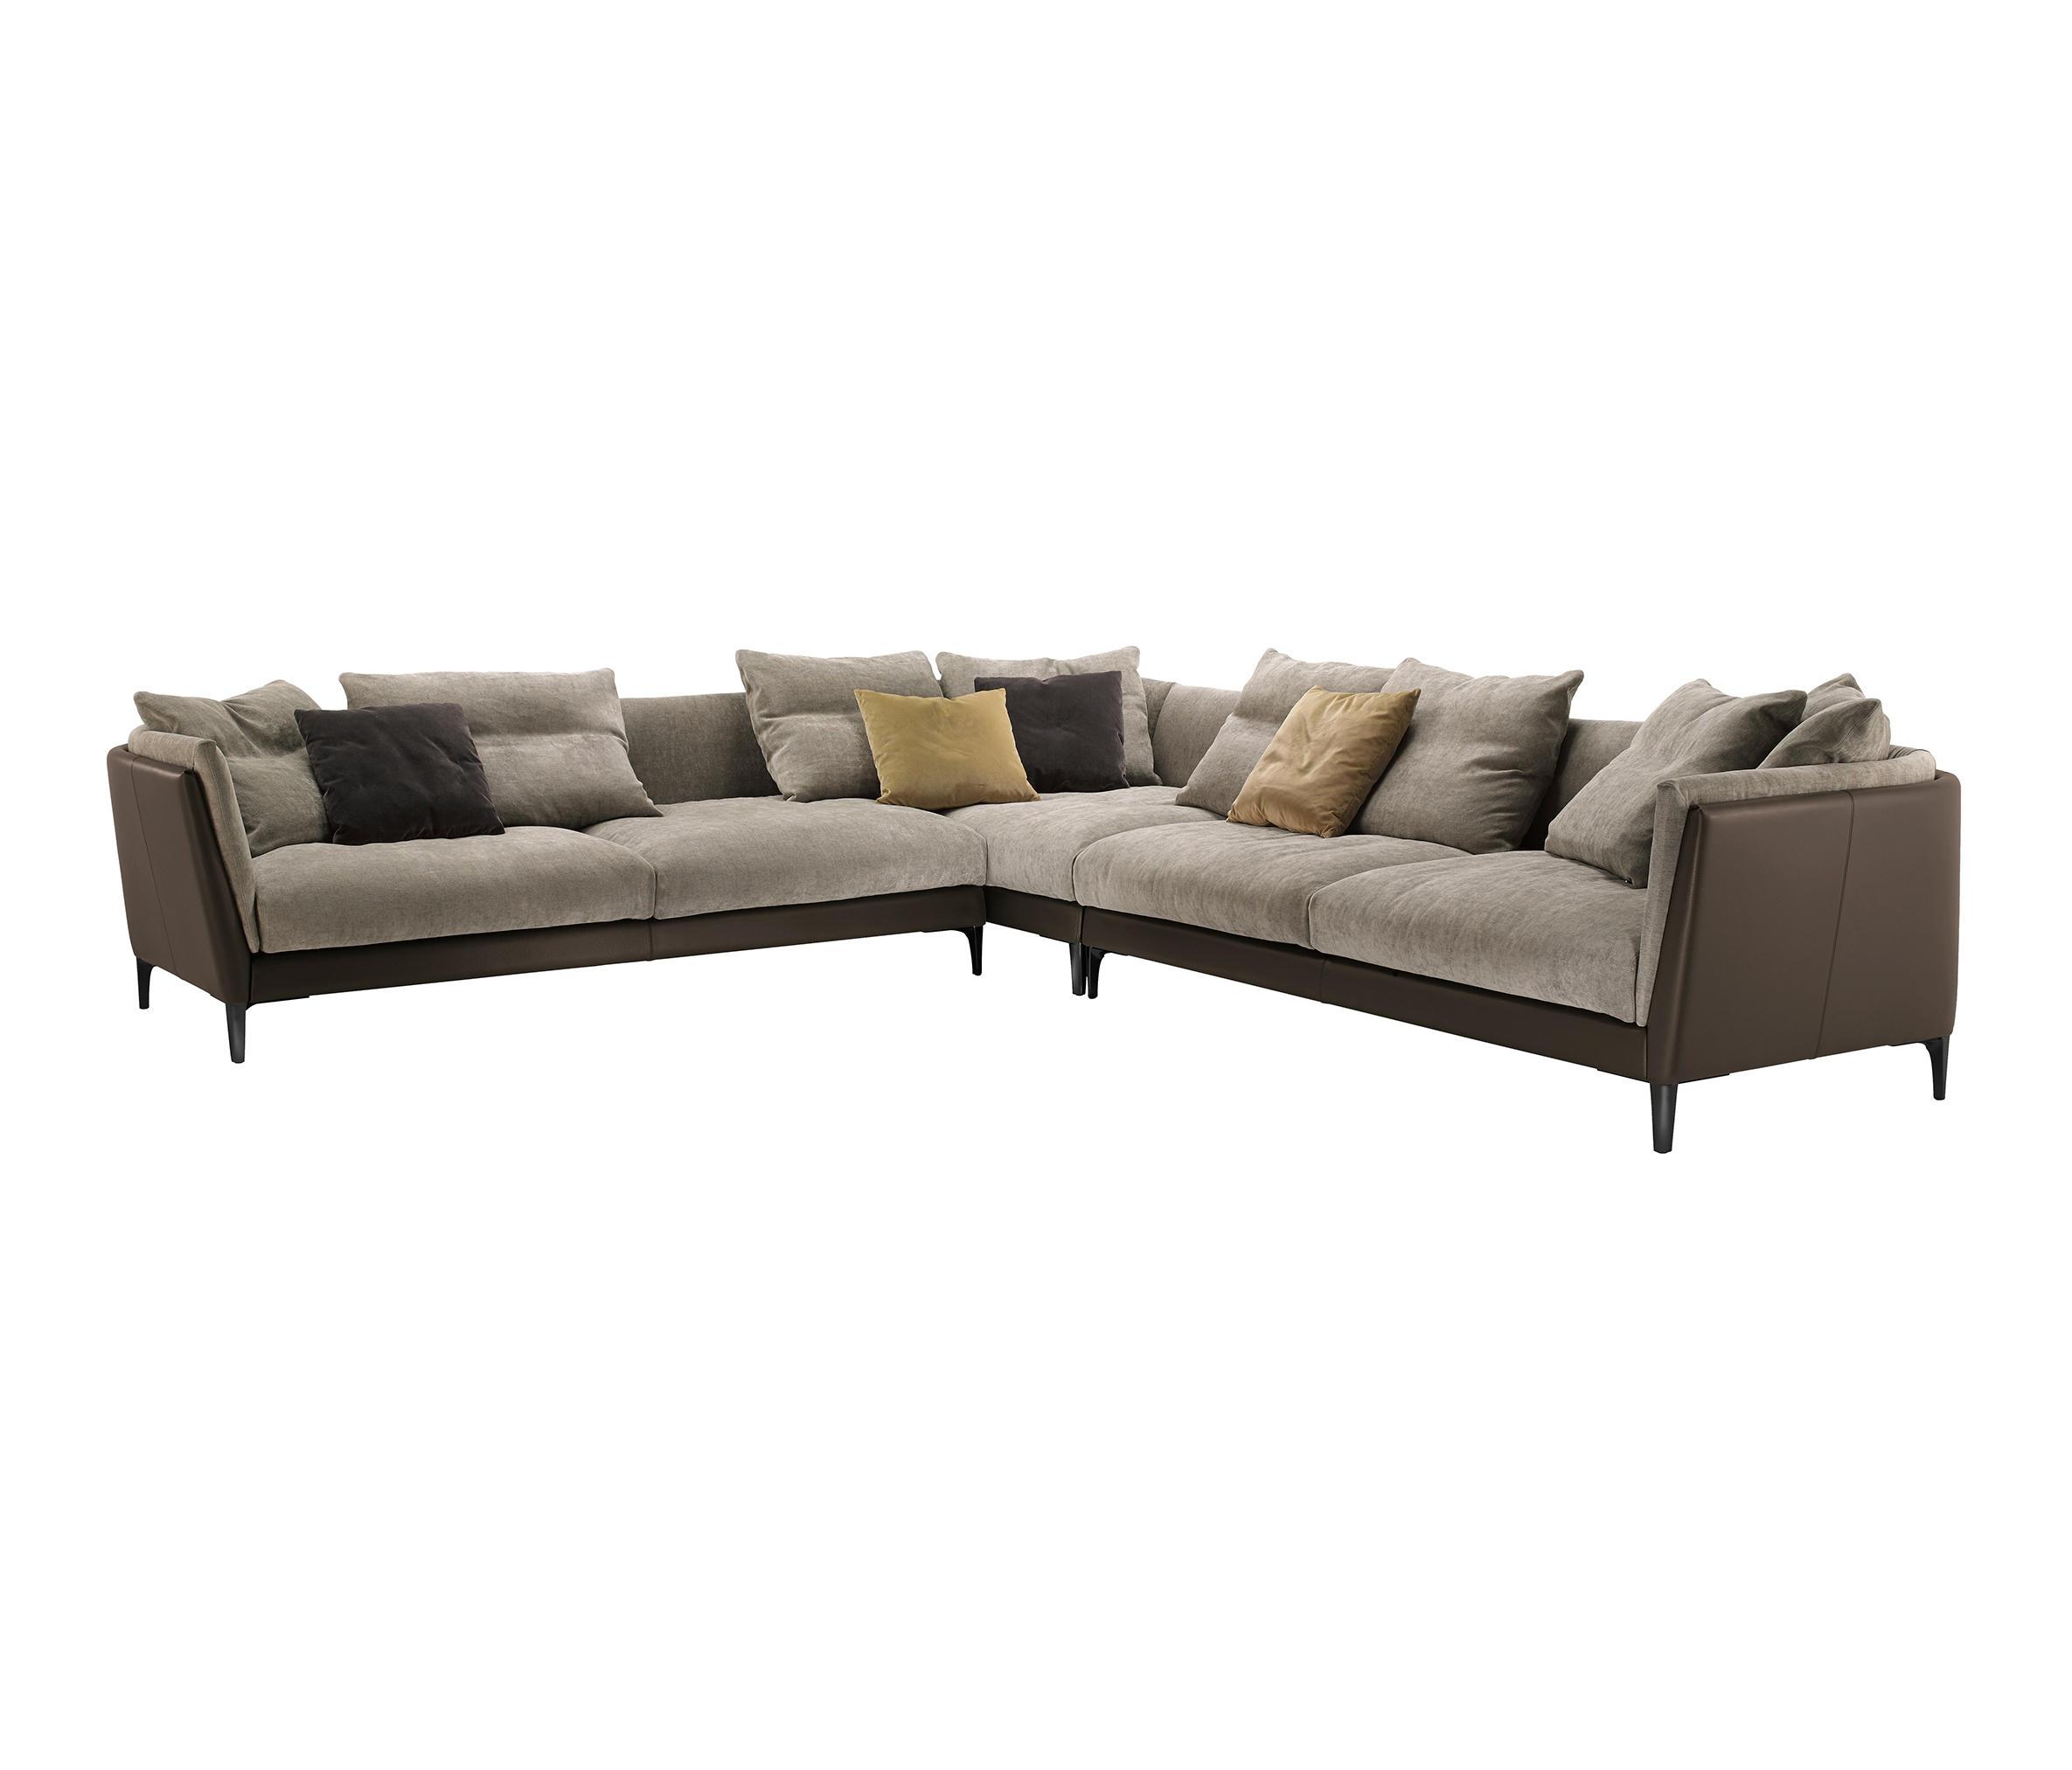 bretagne si ges modulaires de poltrona frau architonic. Black Bedroom Furniture Sets. Home Design Ideas